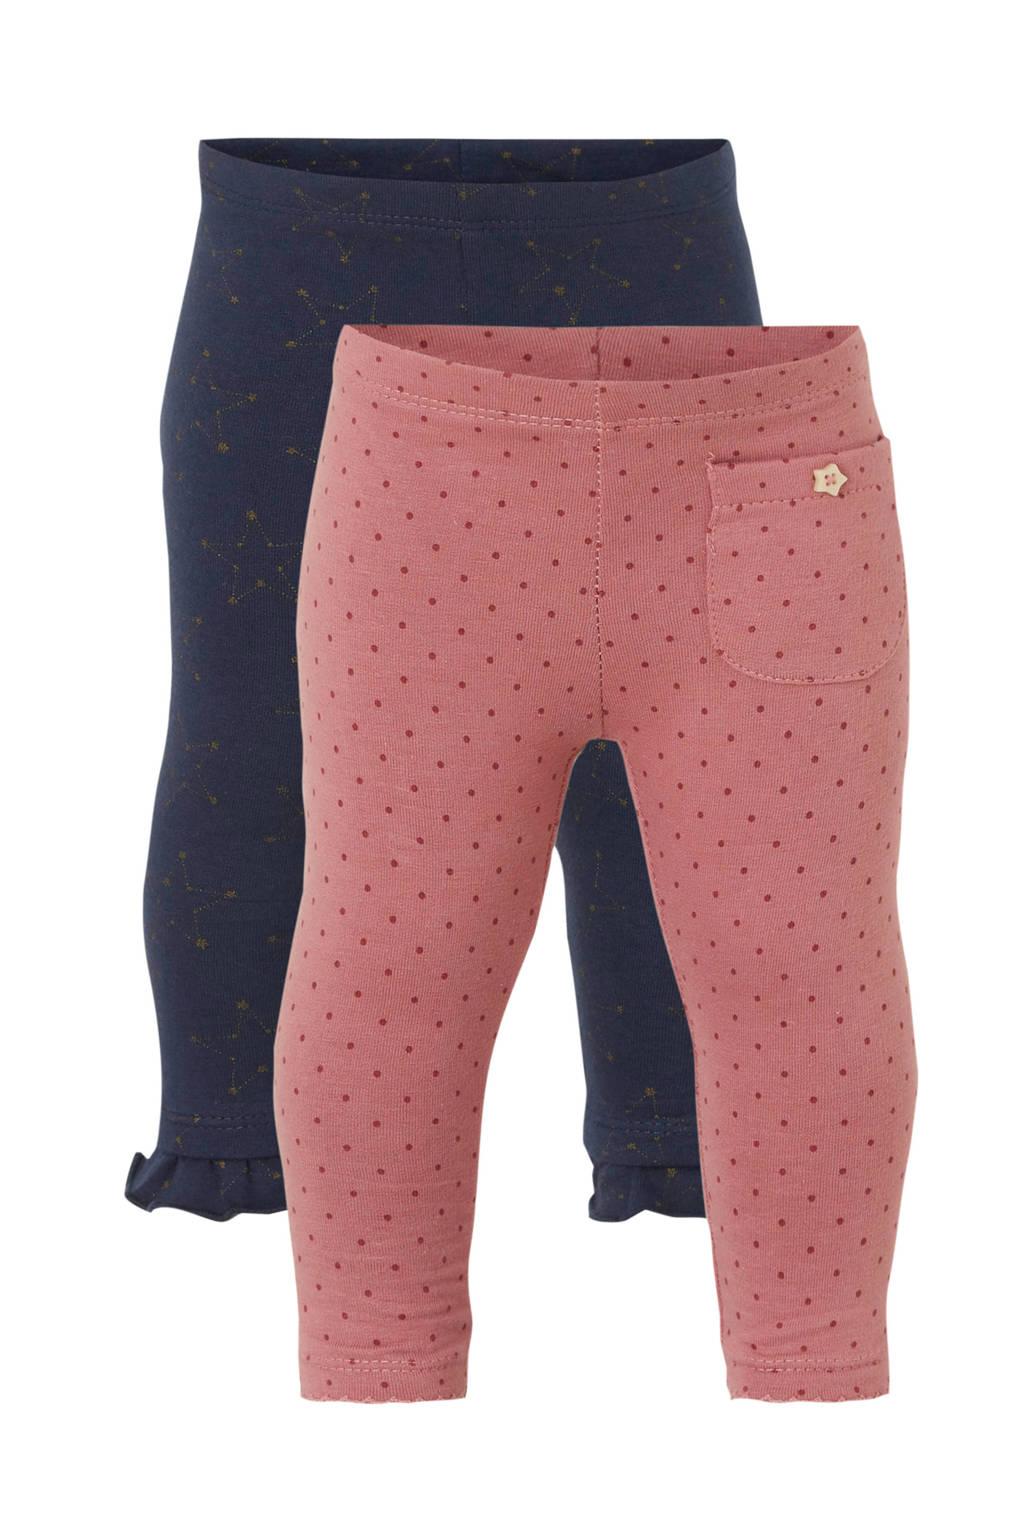 C&A Baby Club legging all over print - set van 2, Donkerblauw/goud